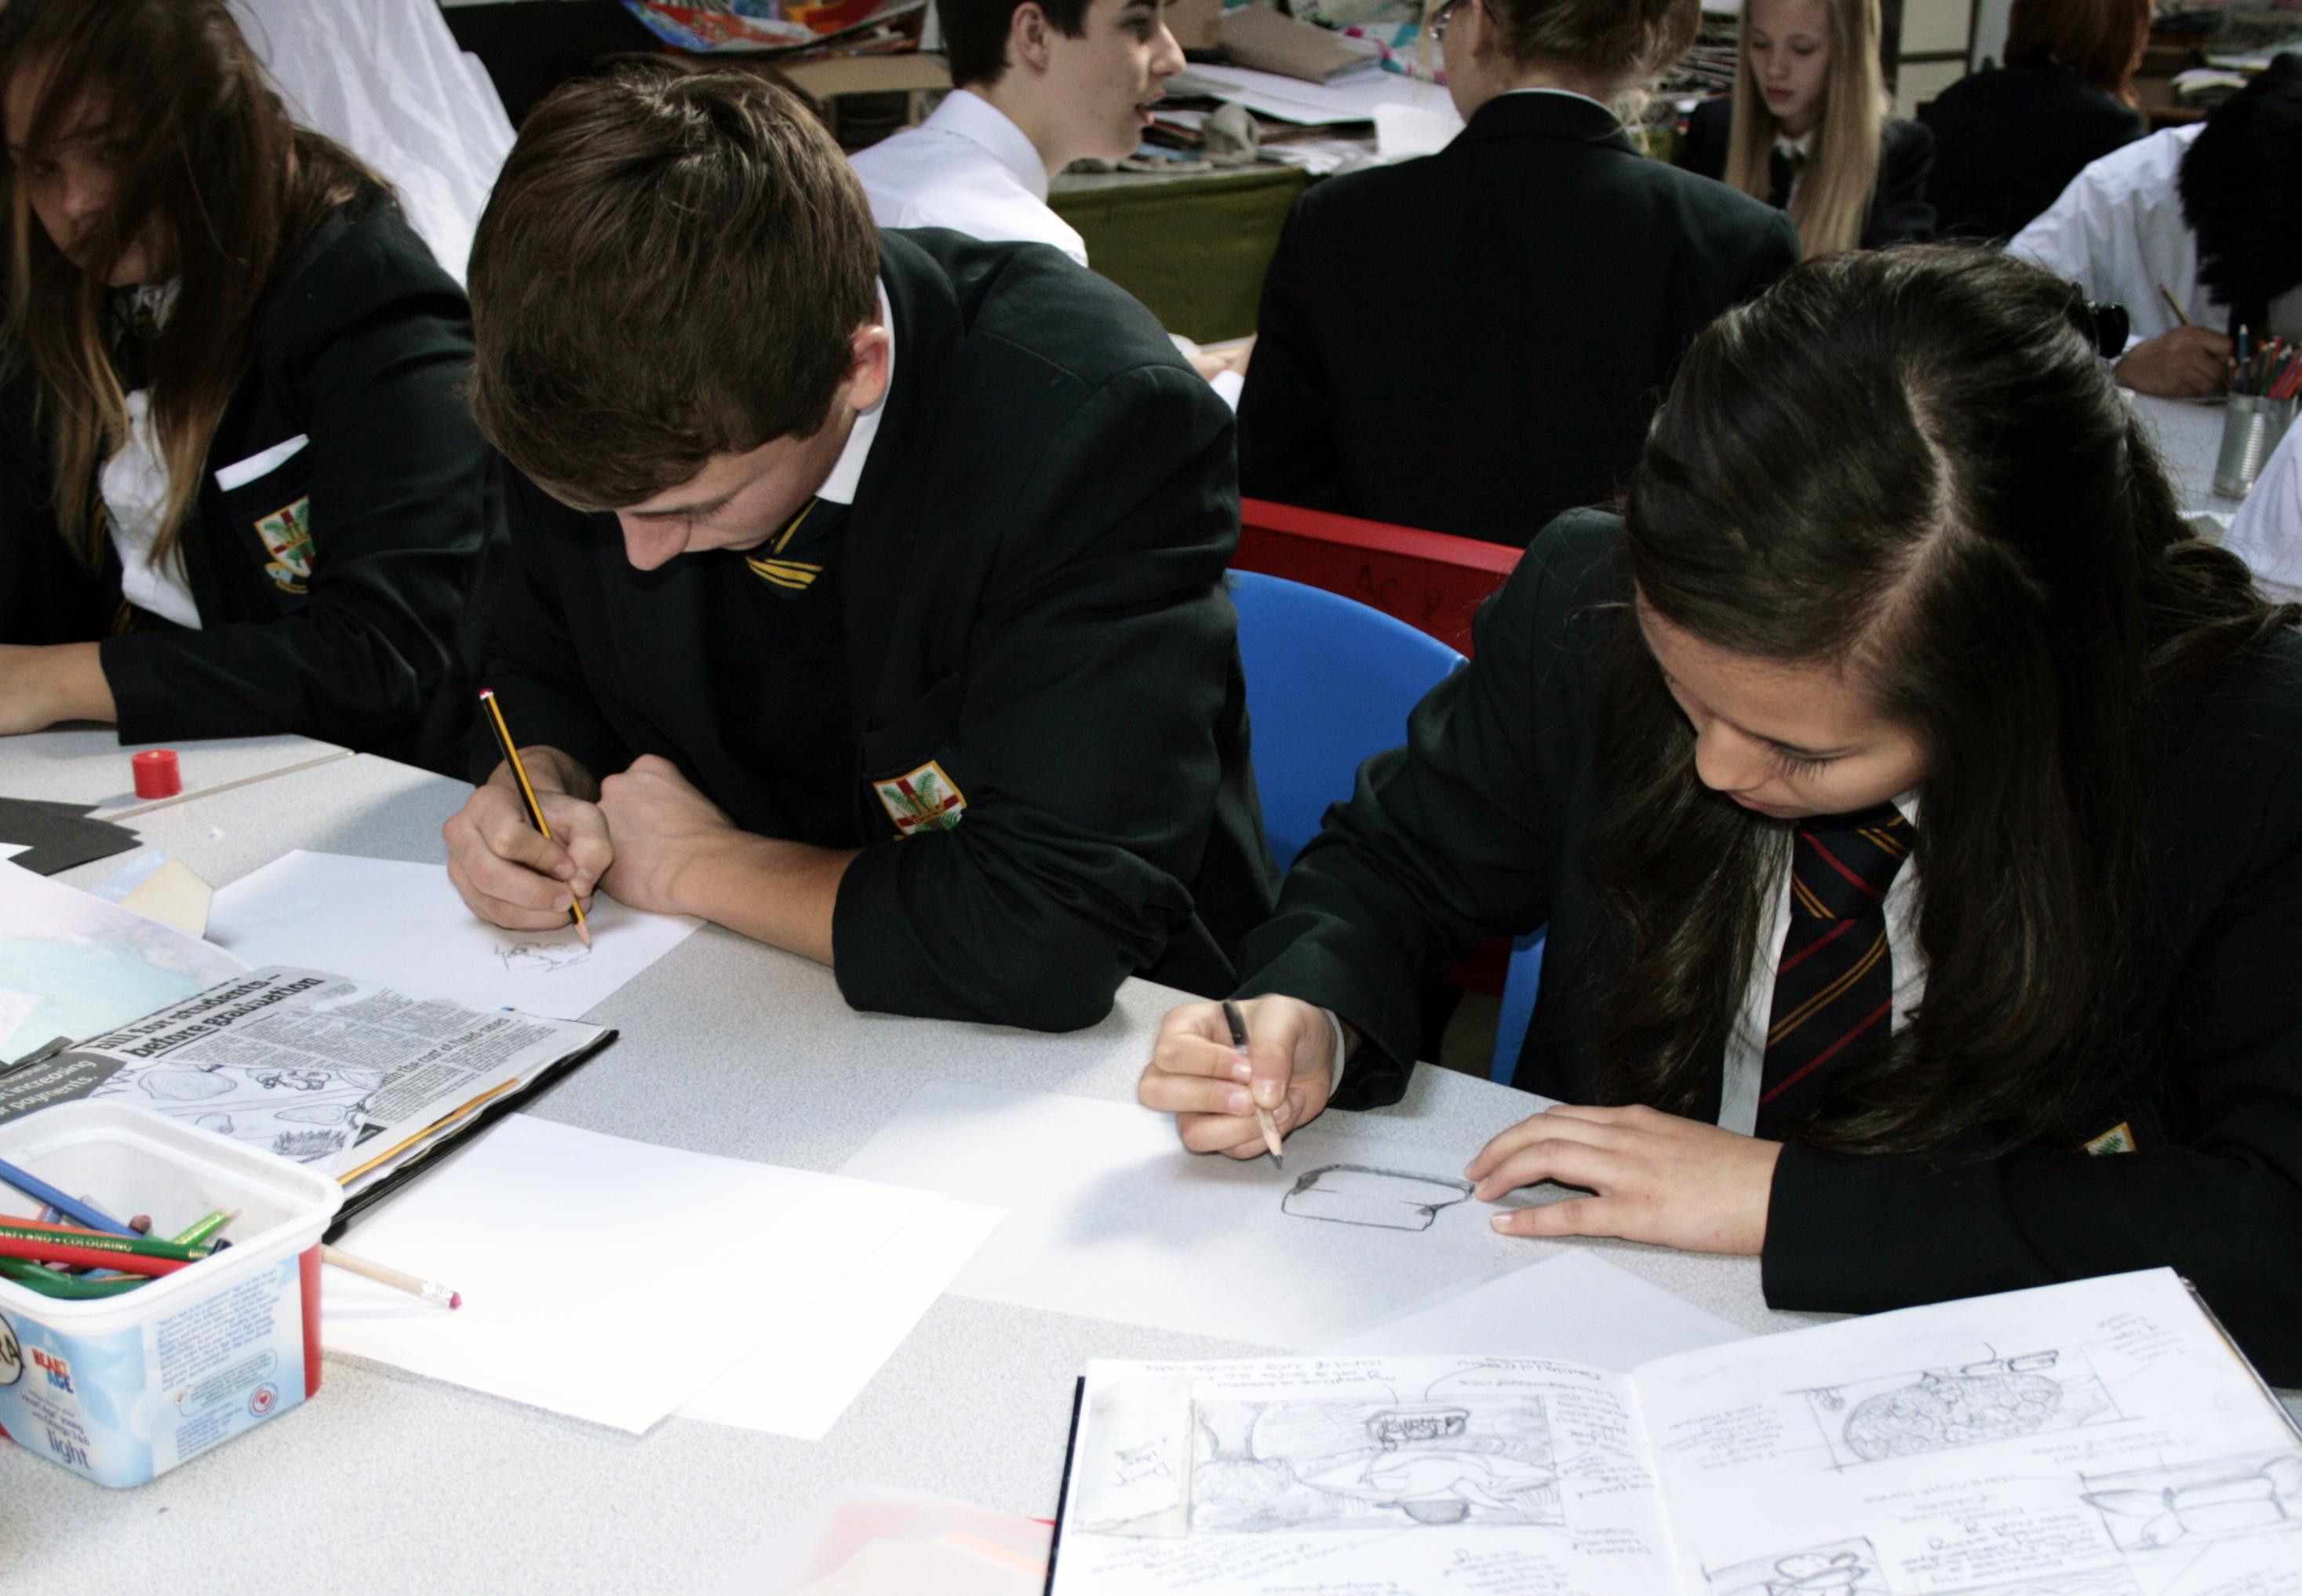 Children writing in work books in class.